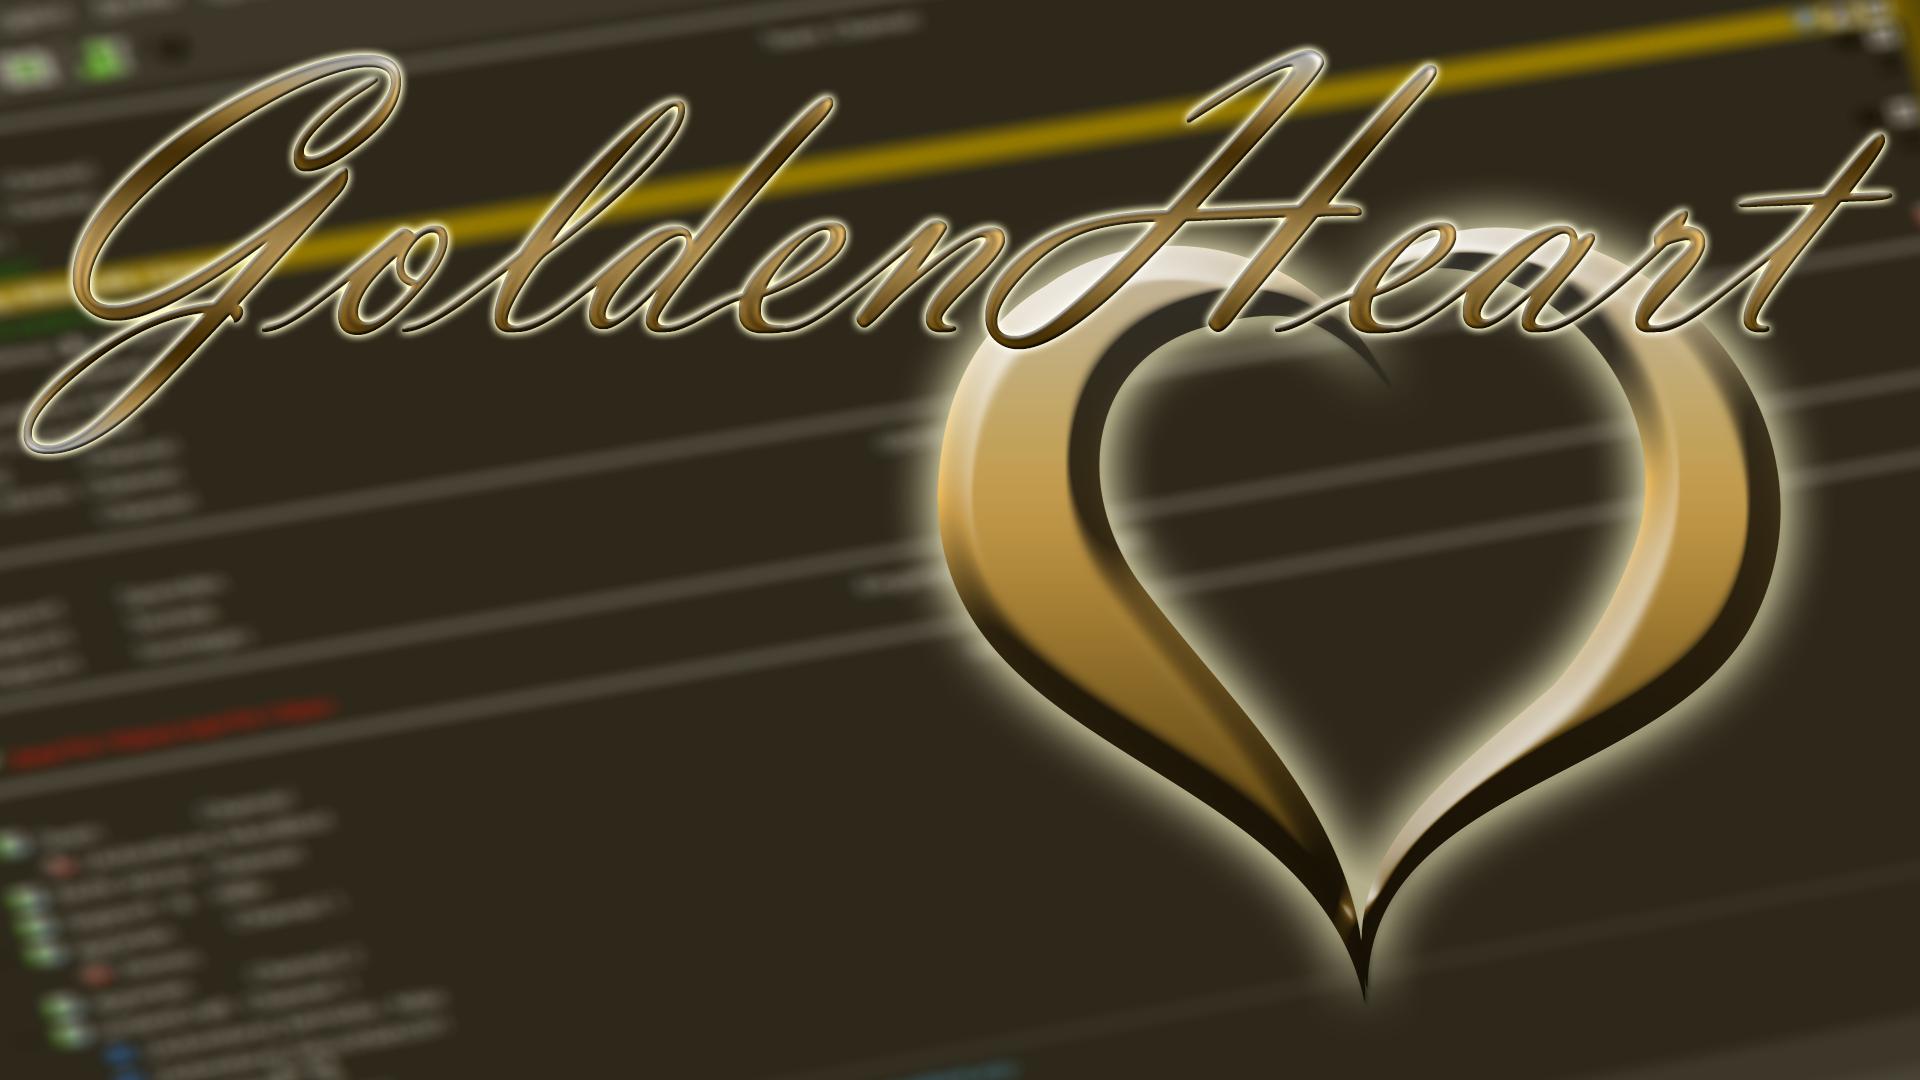 GoldenHeart Style